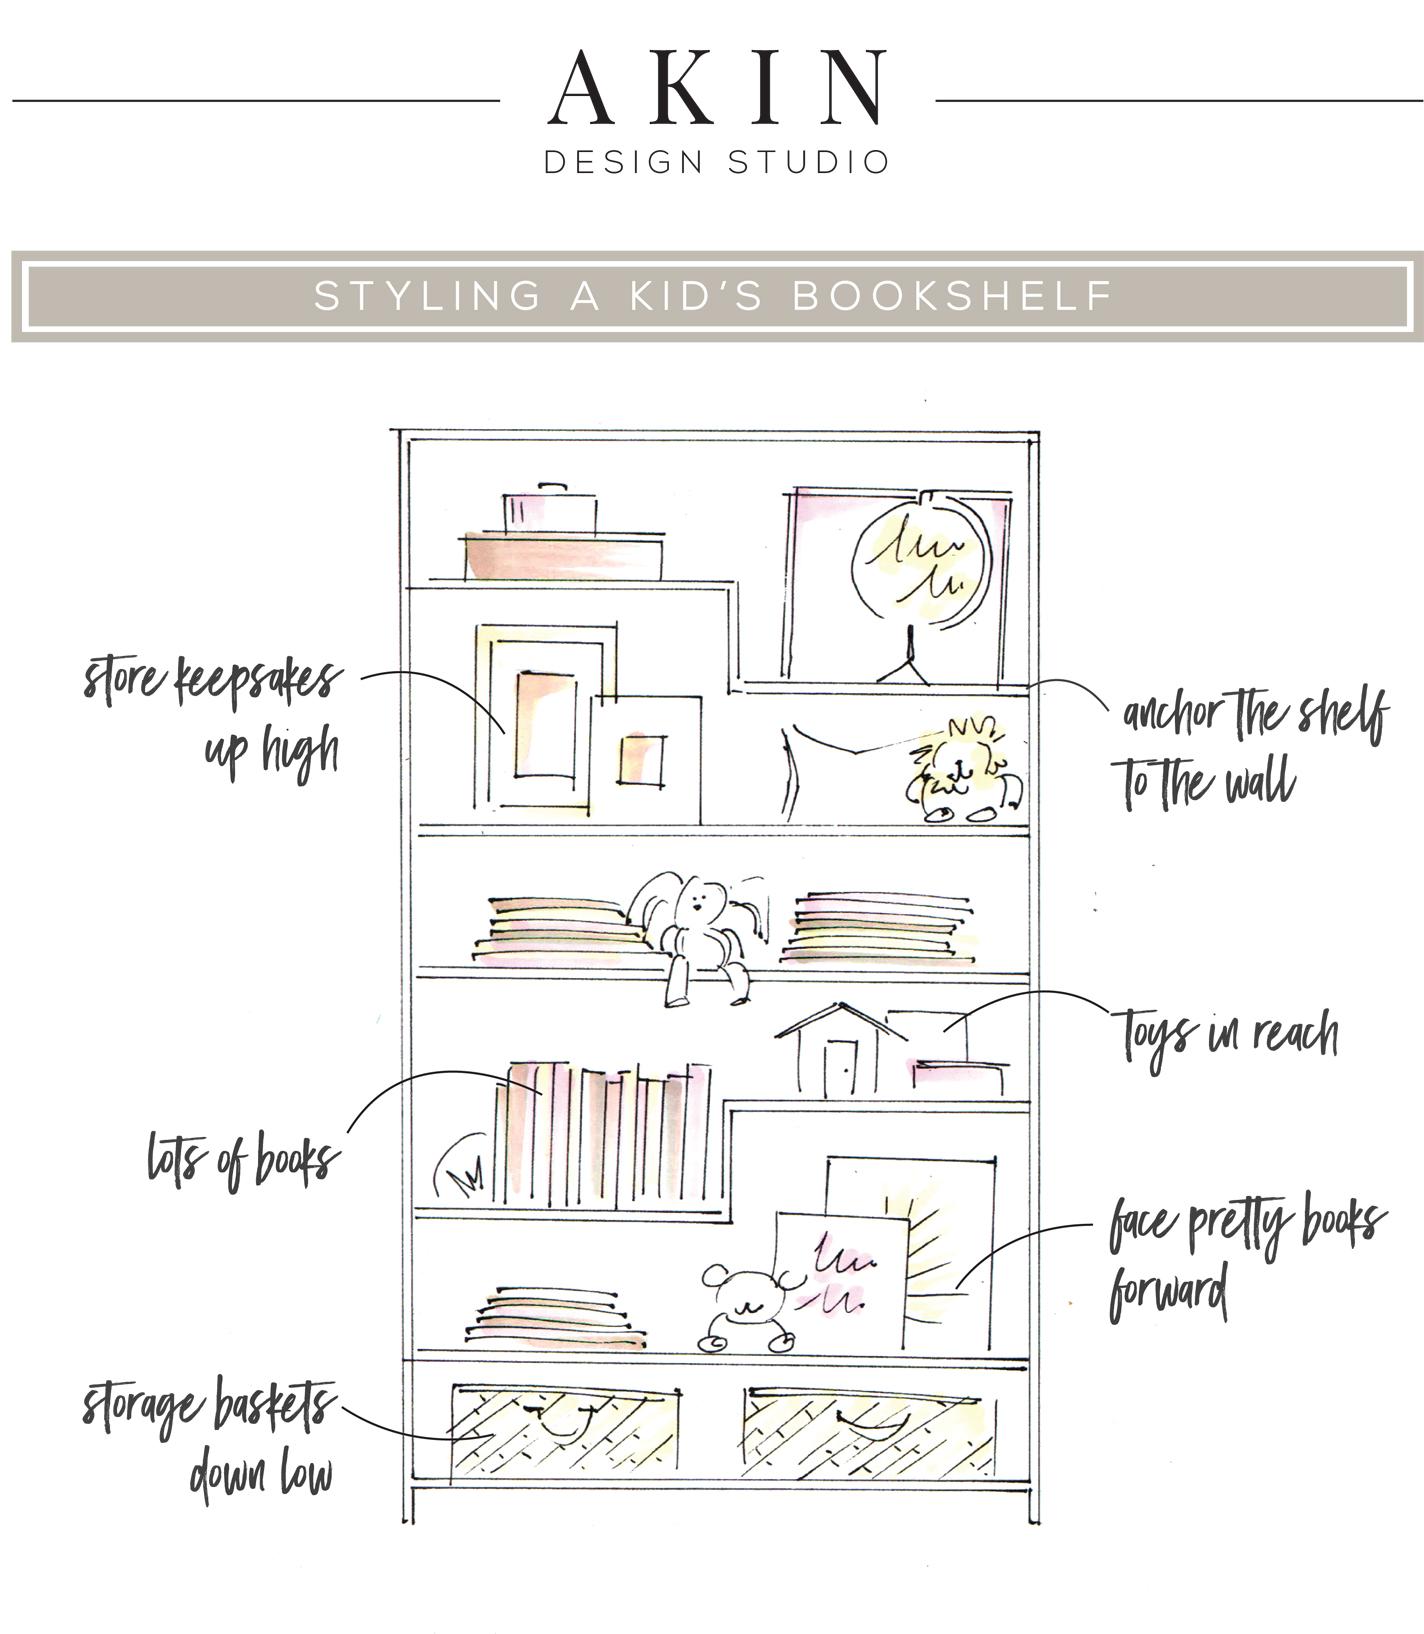 How to Style a Kid's Bookshelf   Akin Design Studio Blog